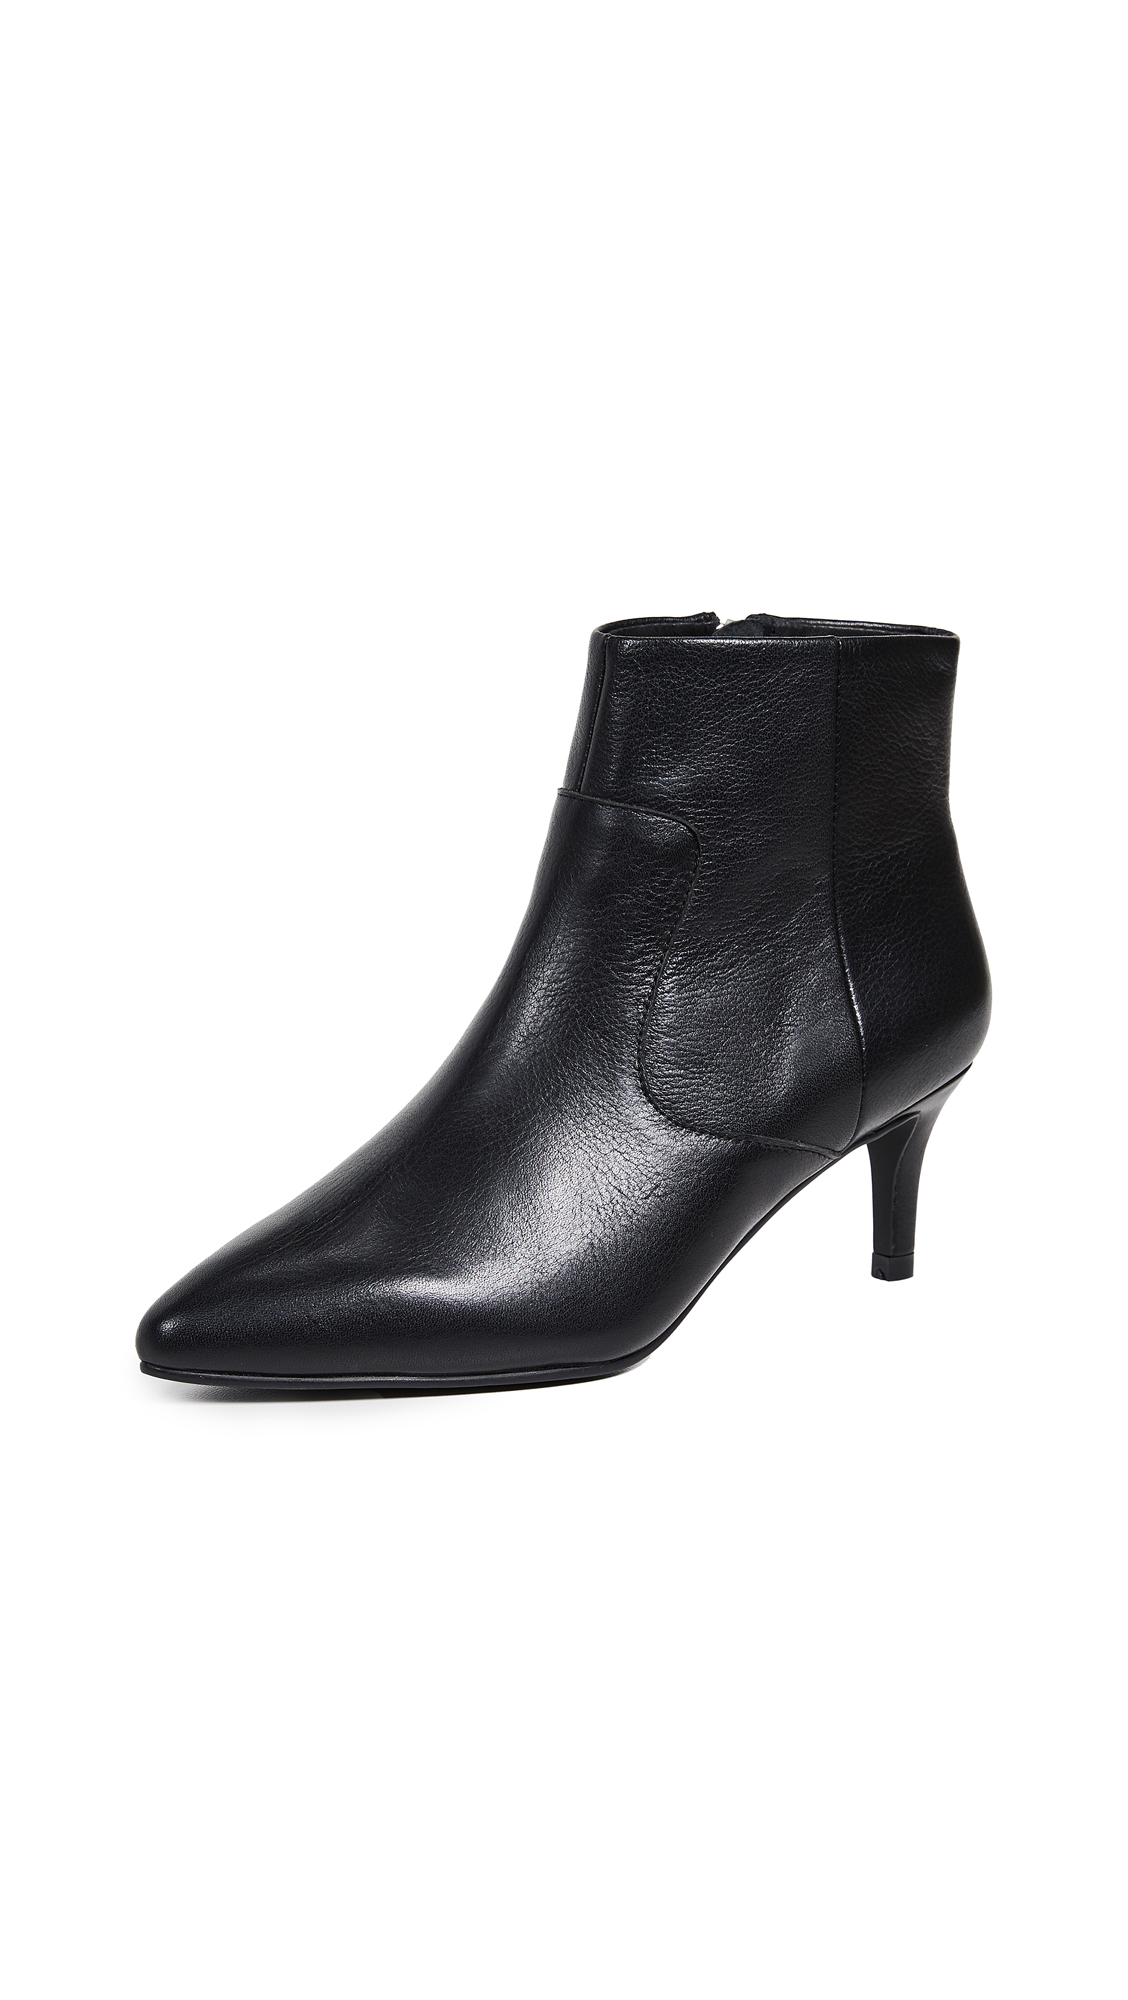 Sol Sana Odin Kitten Heel Booties - Black